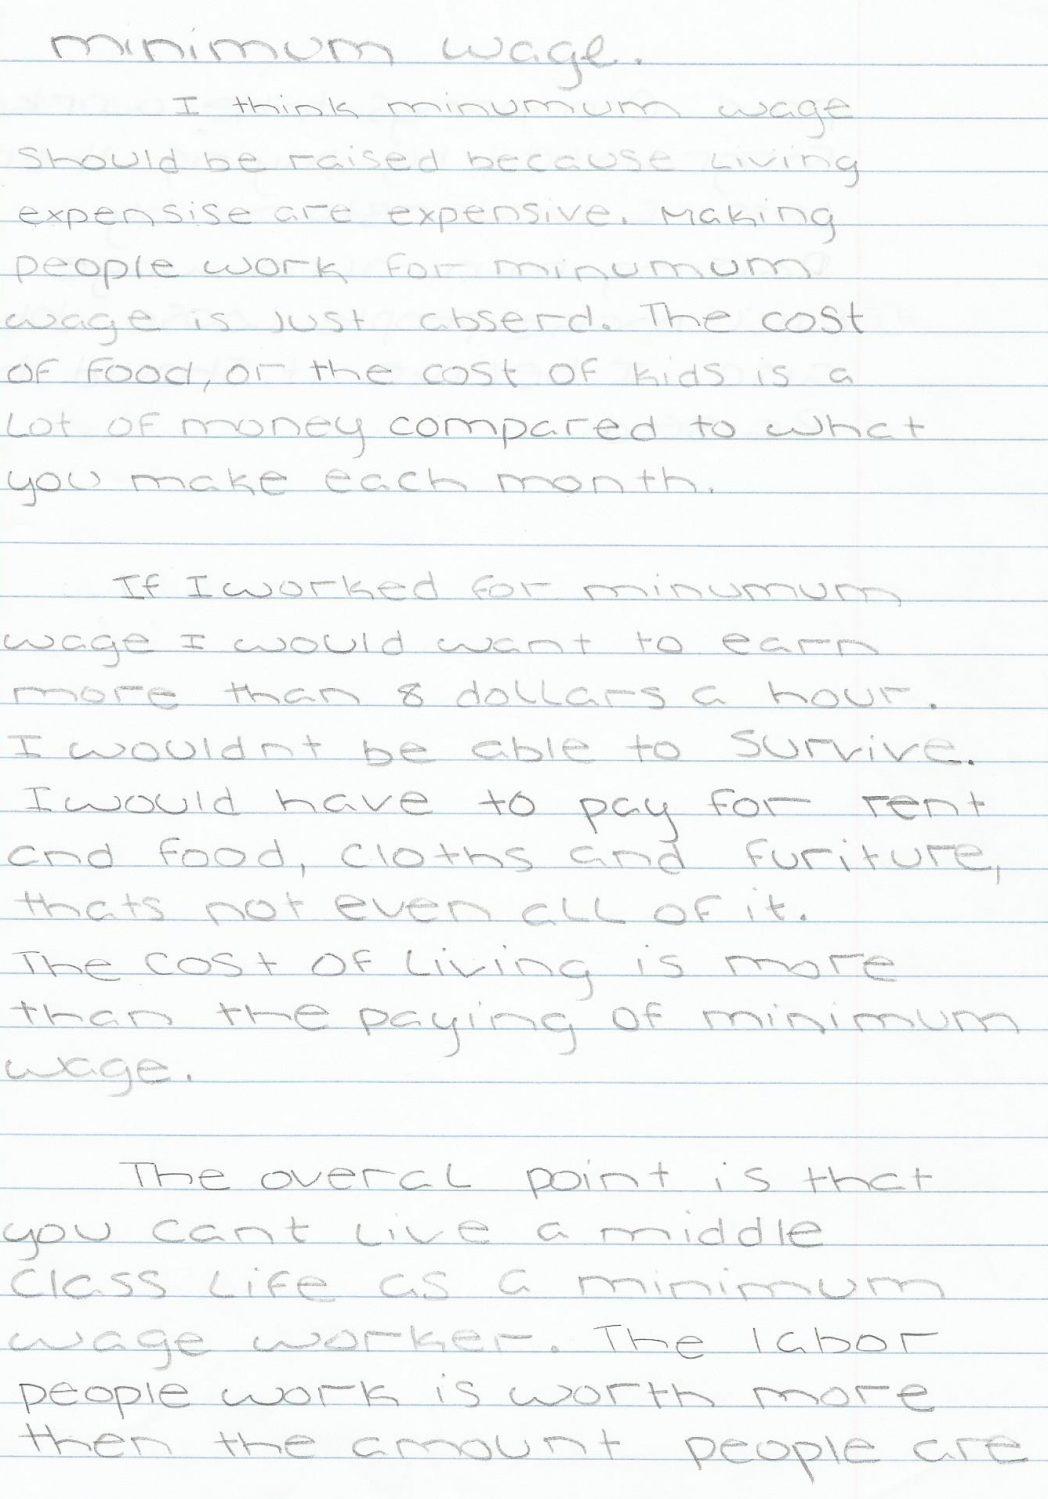 002 Essay Example On Minimum Wage Should Raised Write Schola Increase Argumentative Raising Beautiful Persuasive Free Full